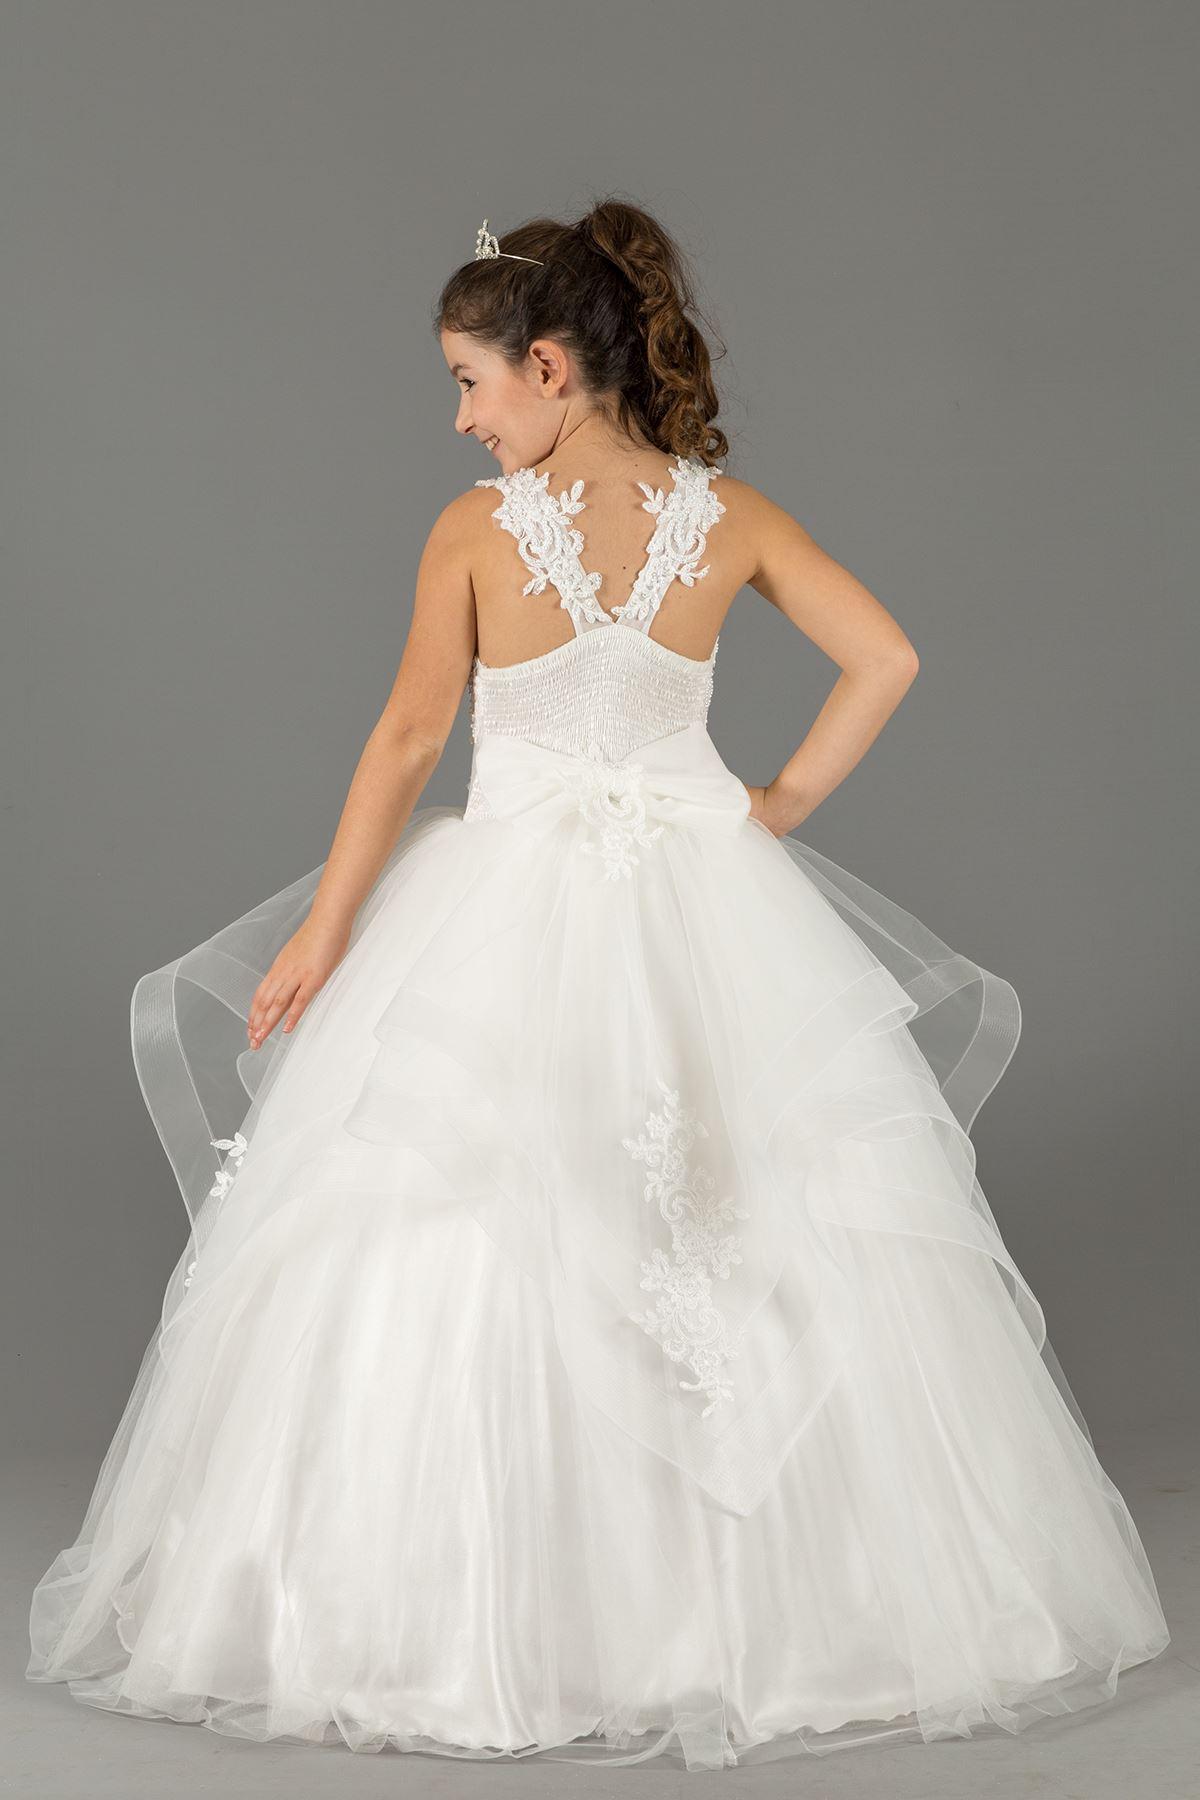 Пухкава вечерна рокля момиче с многослойни детайли пола и бродирани апликации 578 крем